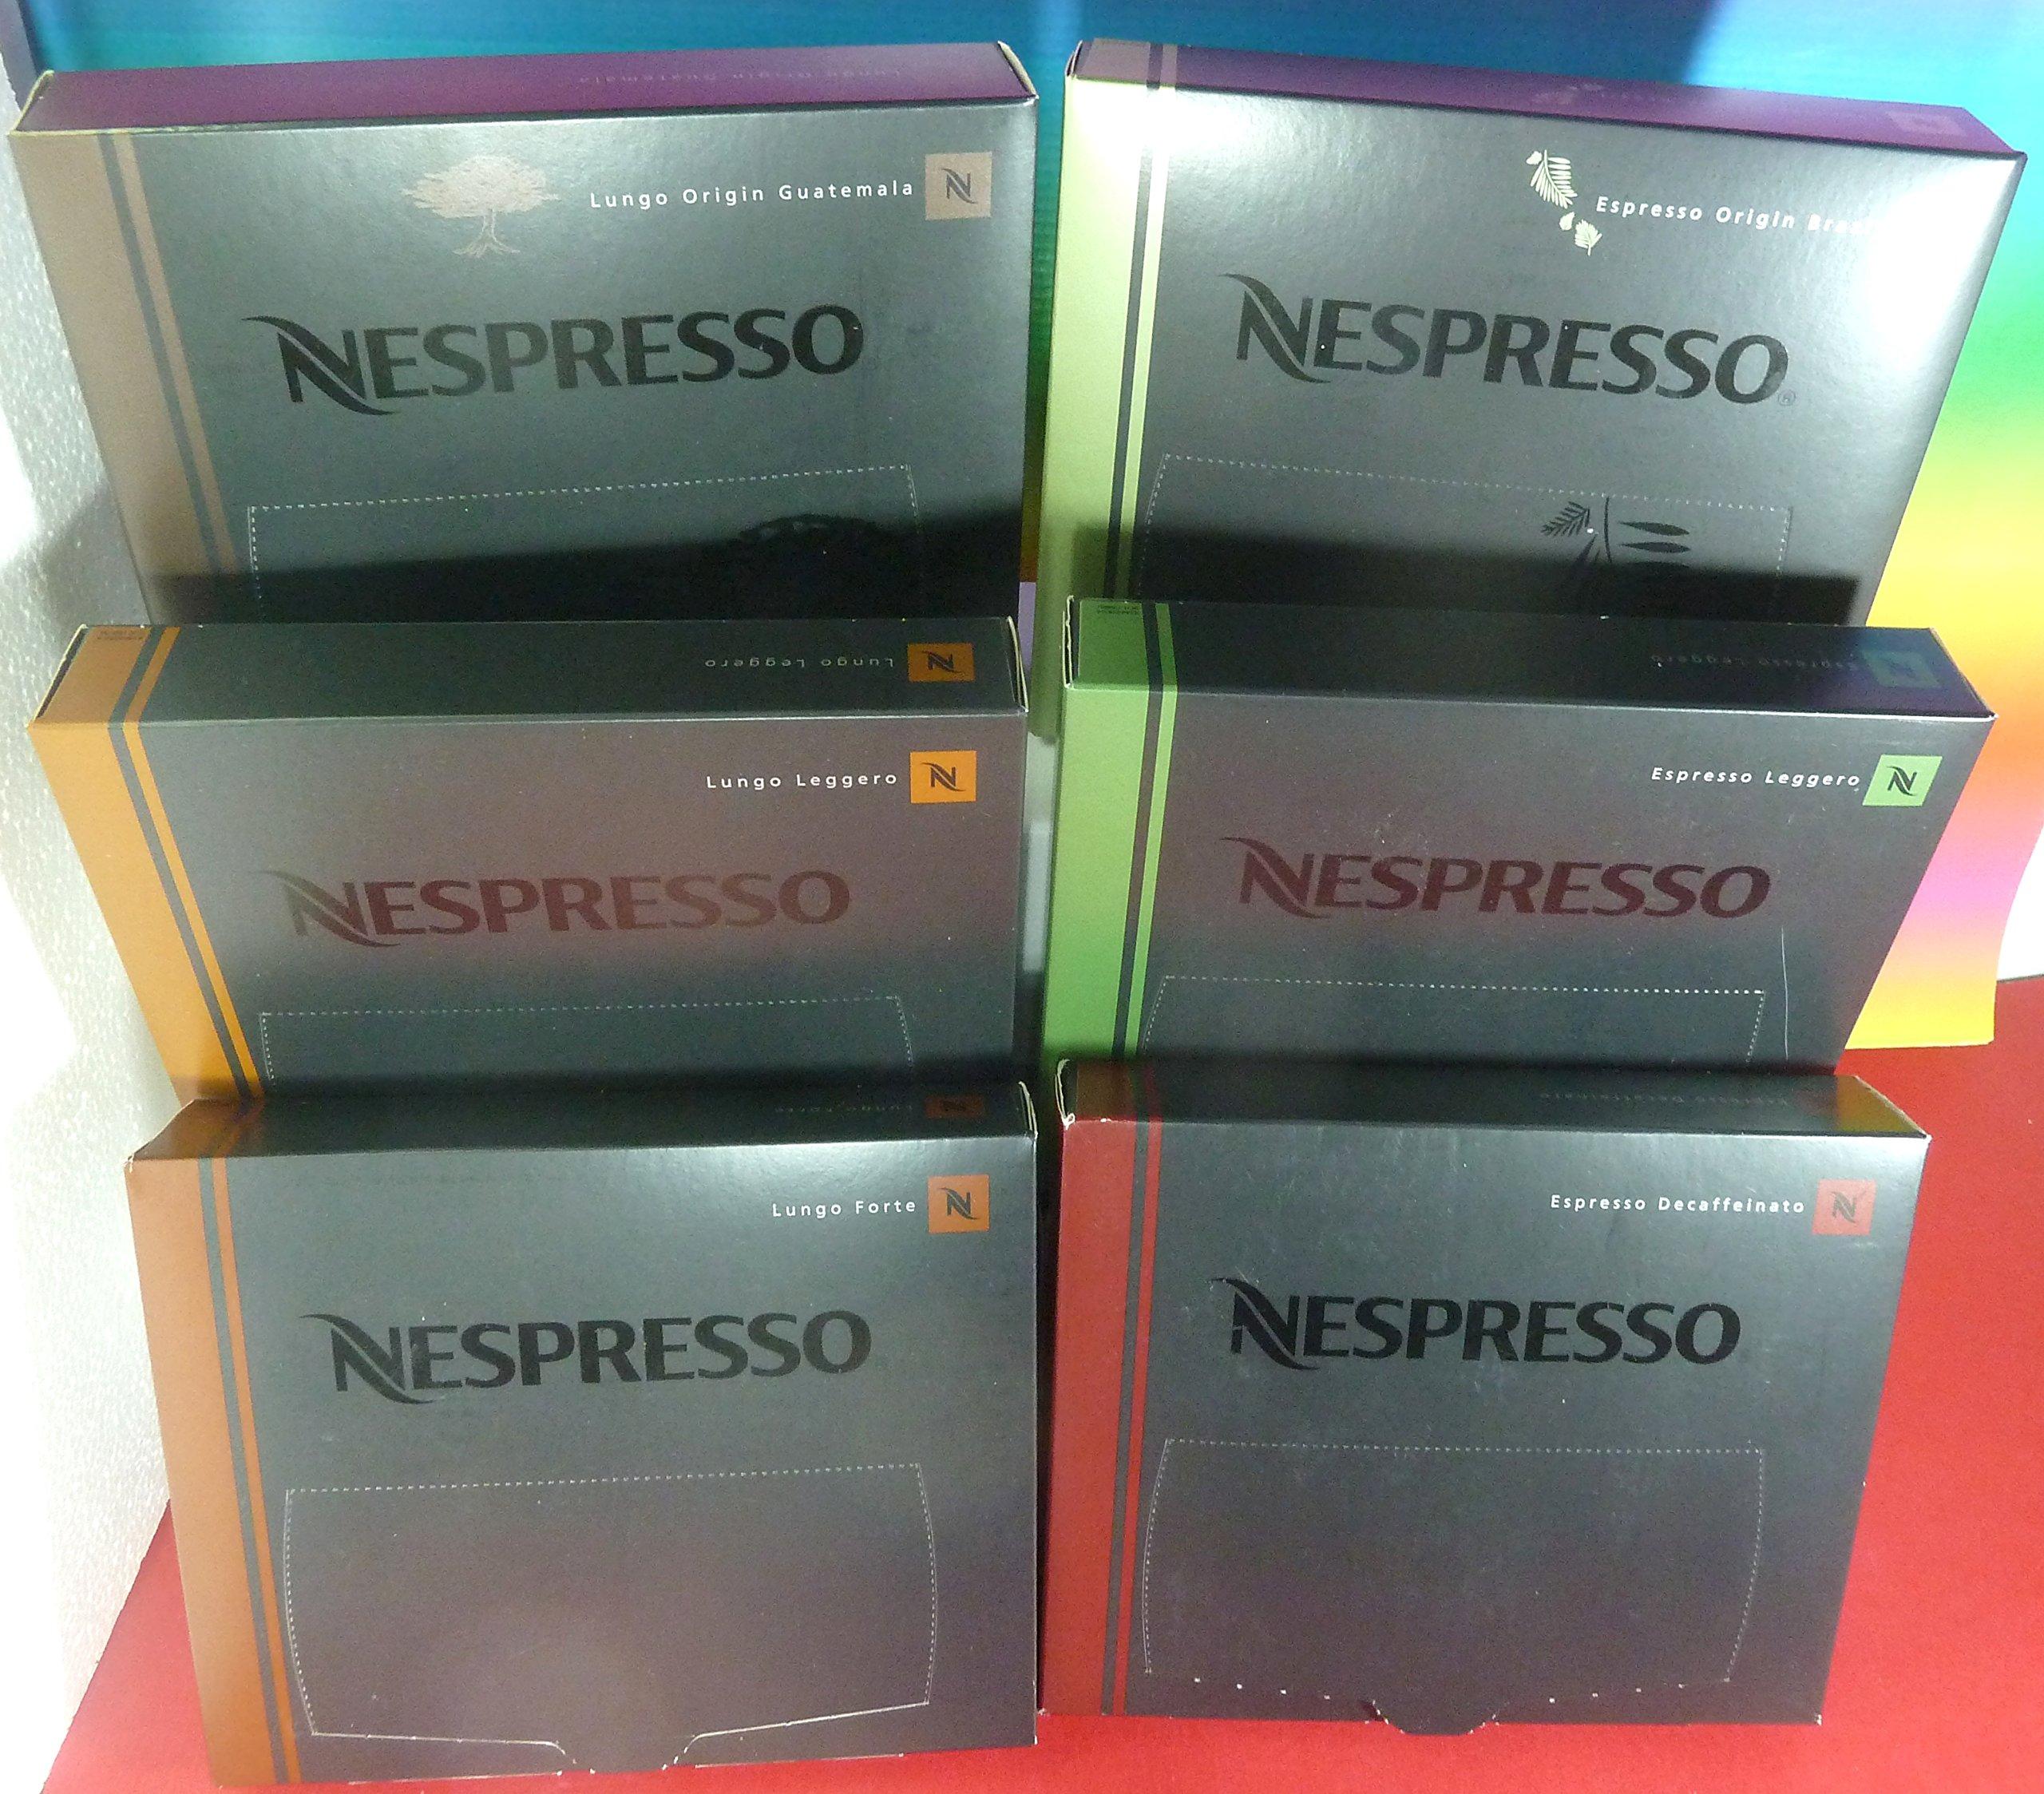 NESPRESSO 6 PACK X 50 PRO ORIGINAL Commercial Capsules,Espresso origin Brazil,Espresso Leggero, Espresso Decaffeinato,Lungo Origin Guatemala,Lungo Forte,Lungo Leggero